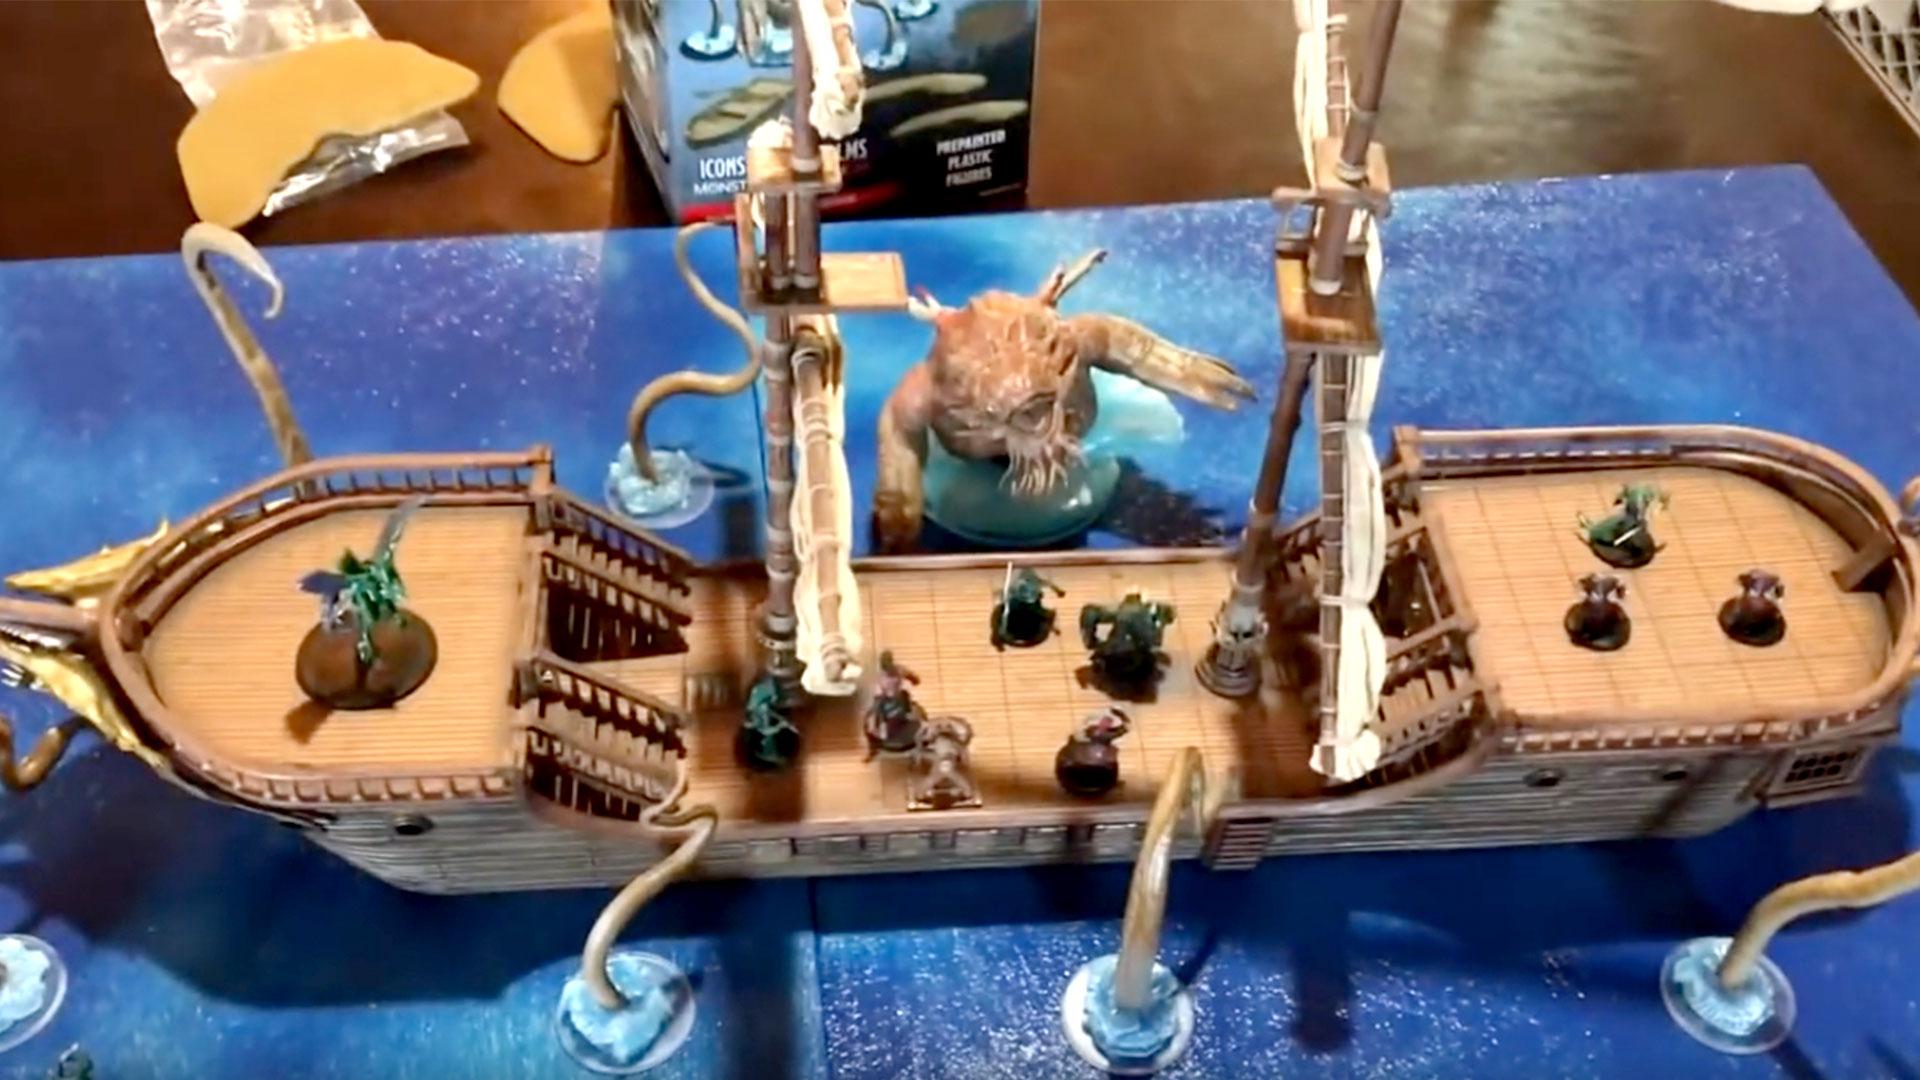 The Falling Star Sailing Ship Wizkids